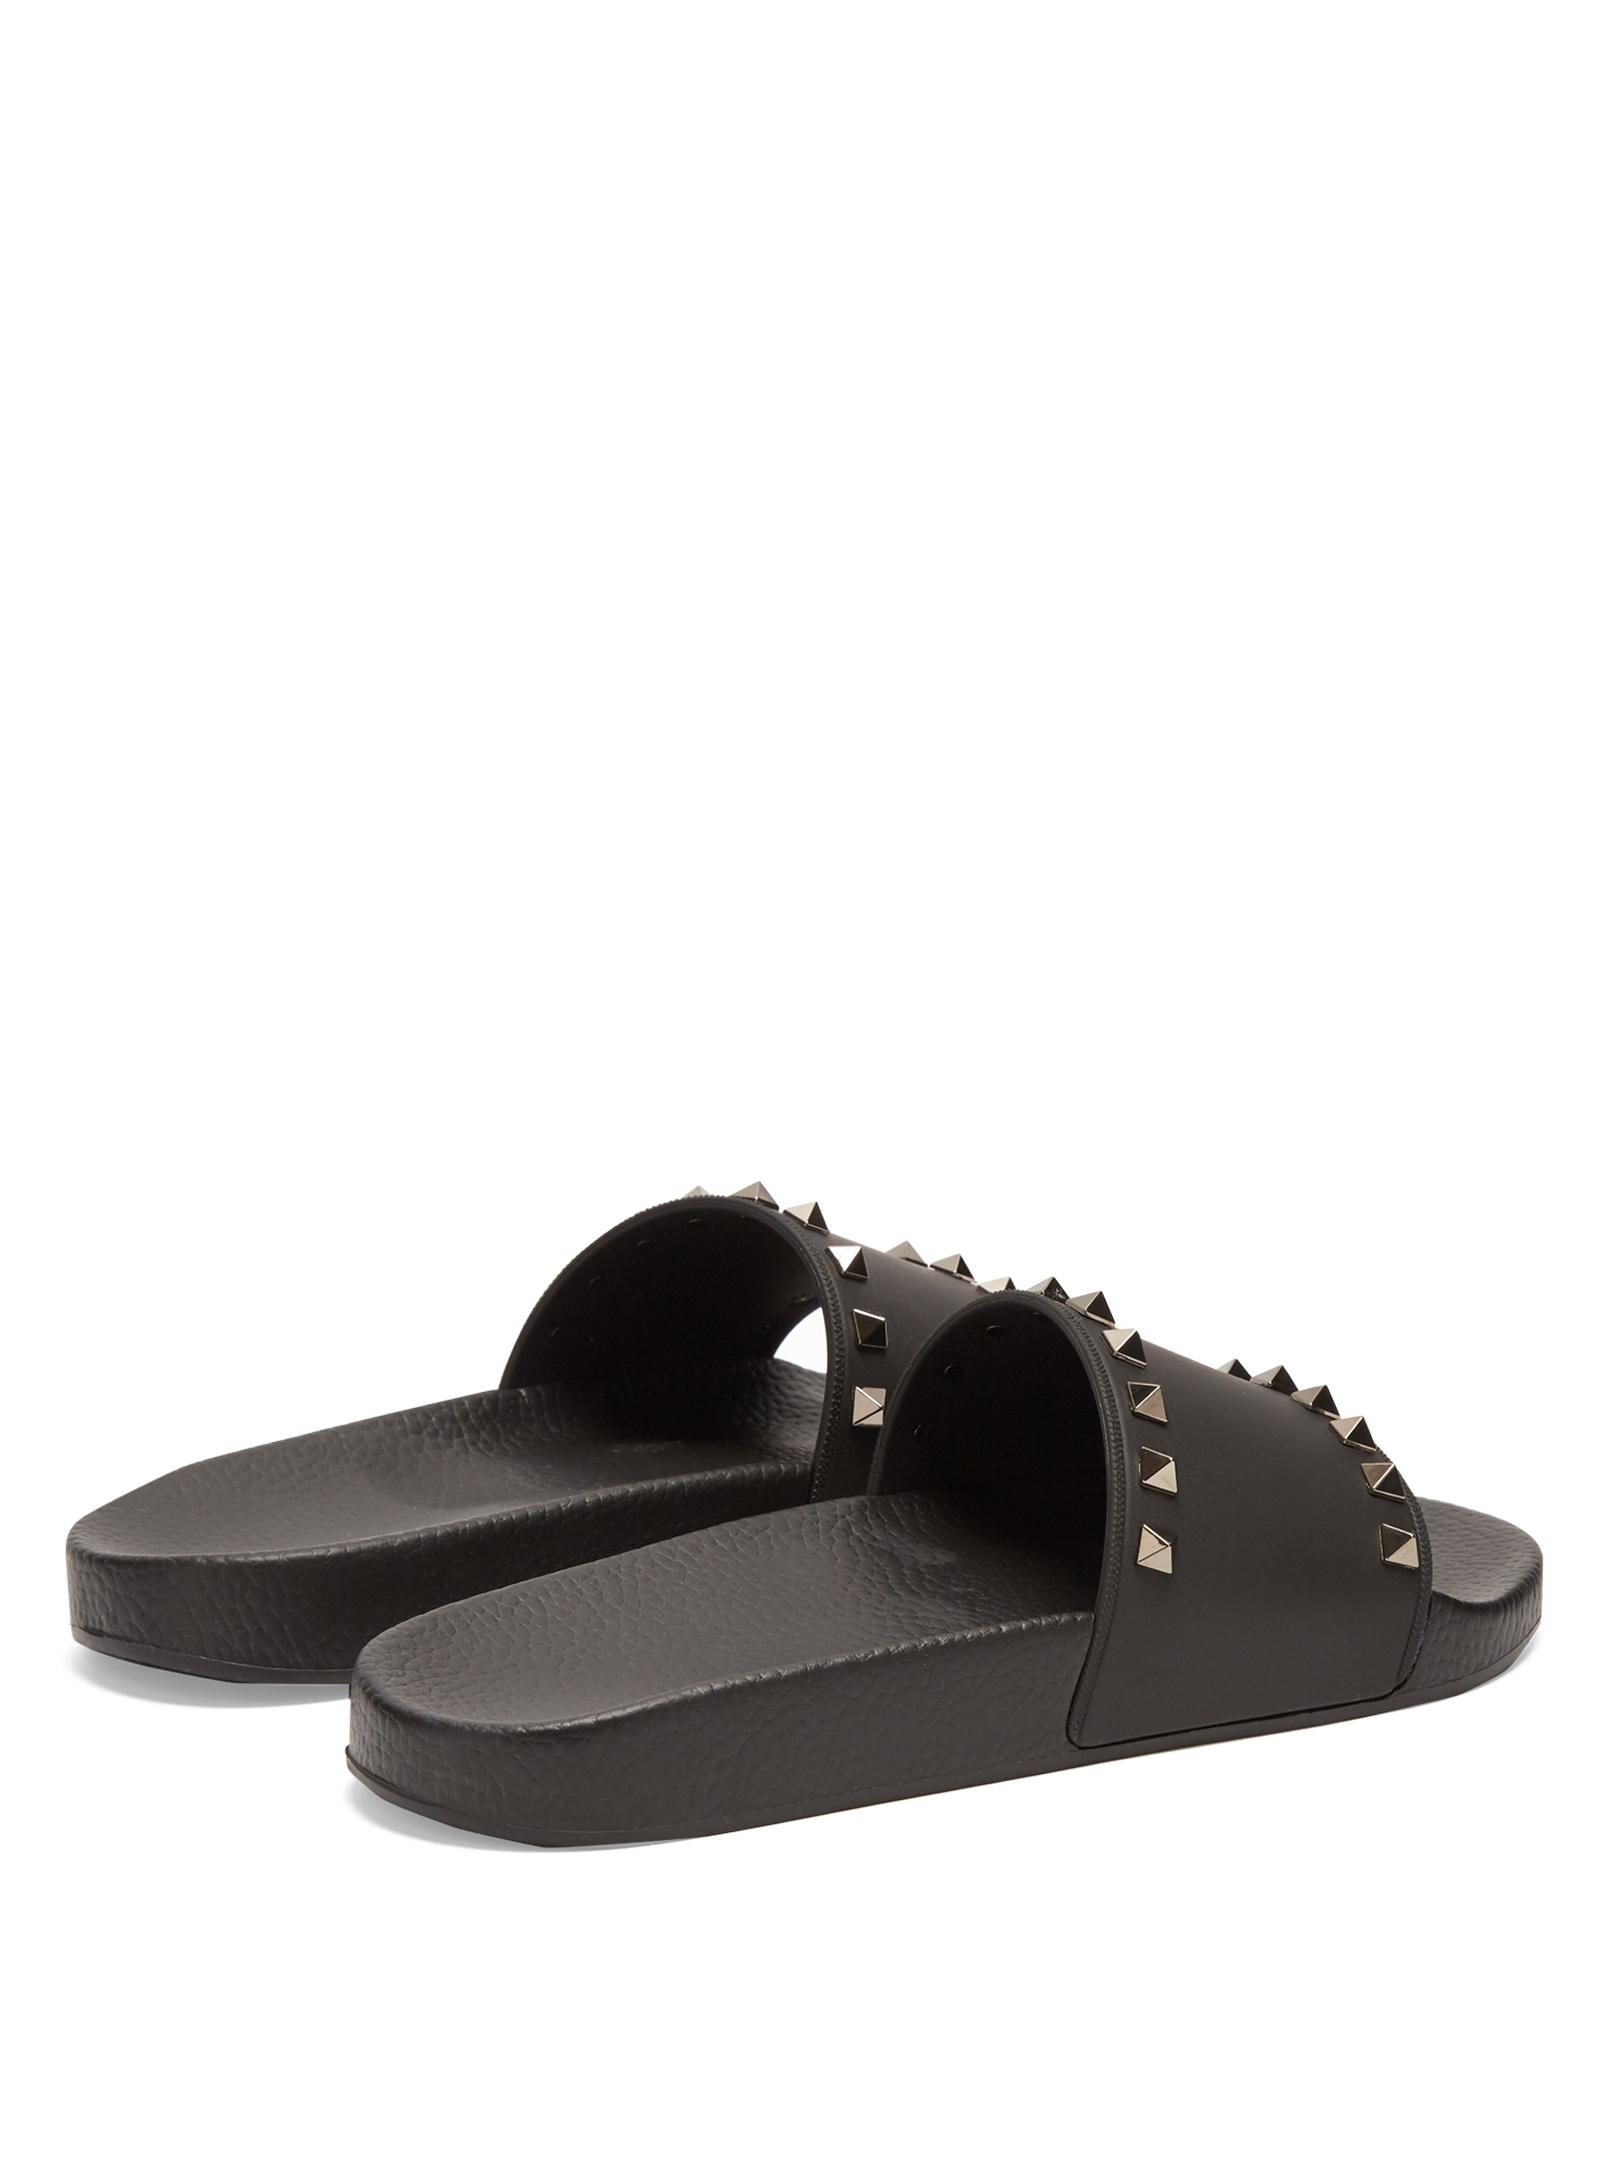 Valentino Rockstud Rubber Slides d7hQL9Bf